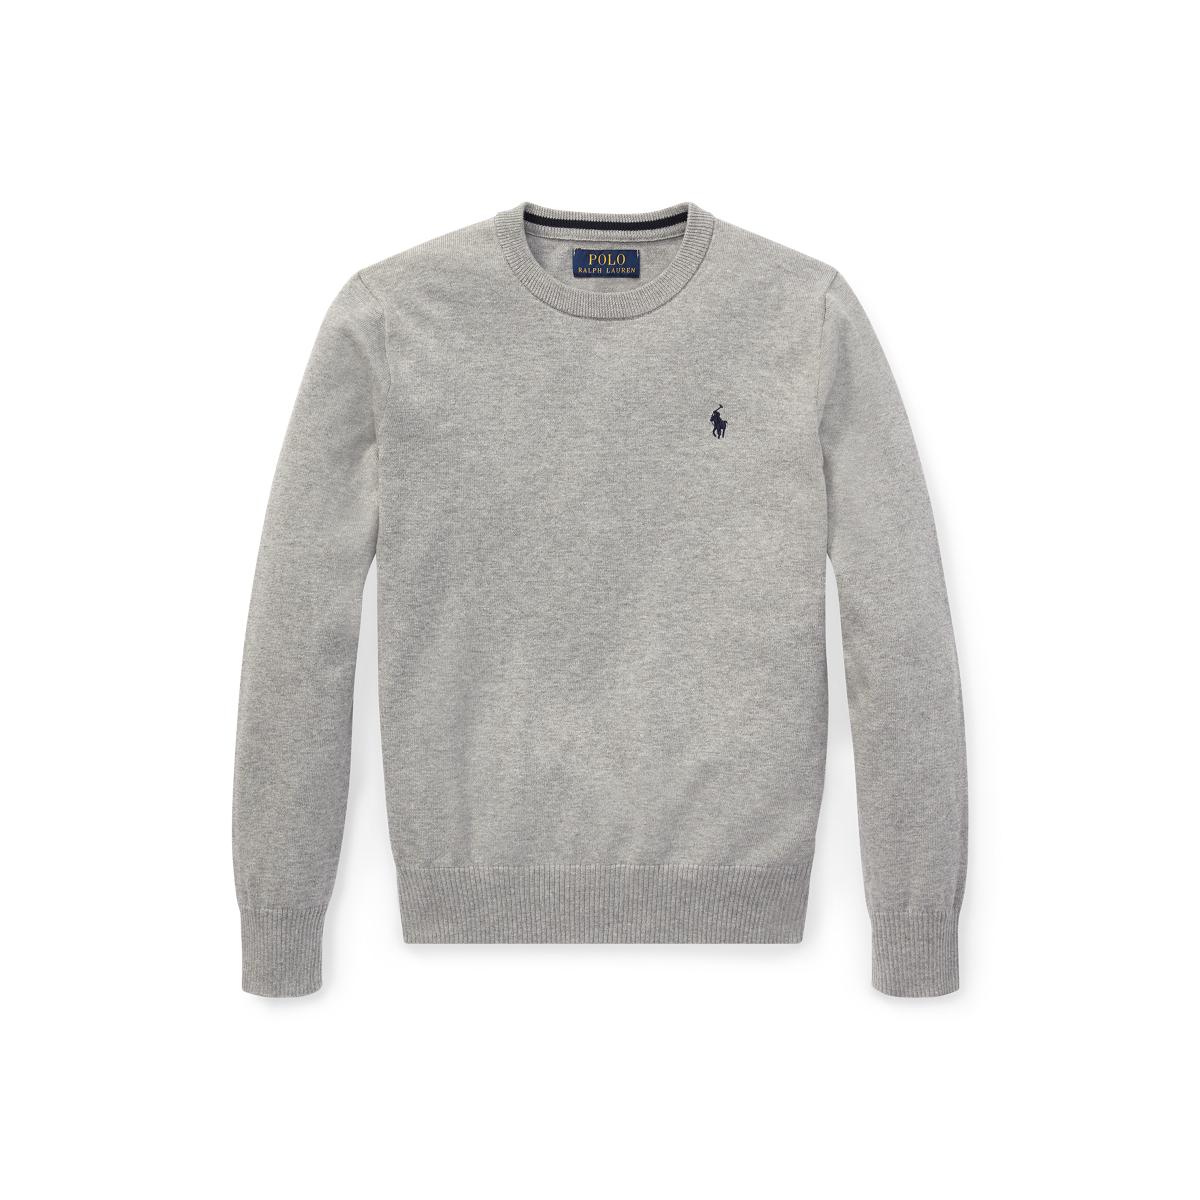 639cf743f Cotton Crewneck Sweater